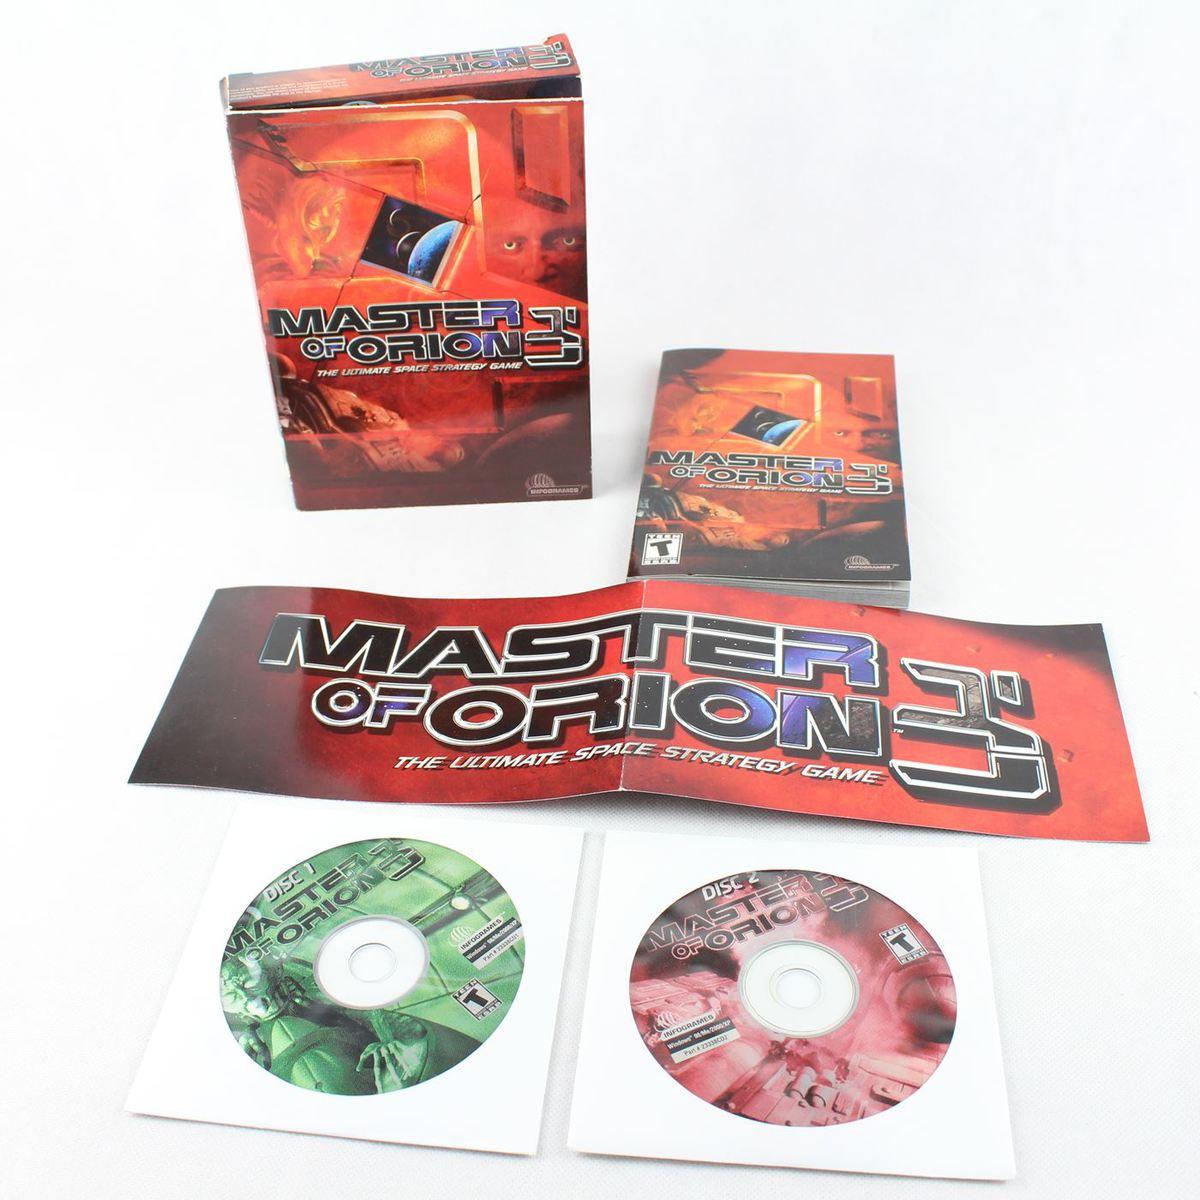 Master of Orion 3 (PC Small Box, 2003, Quicksilver / Infogrames)